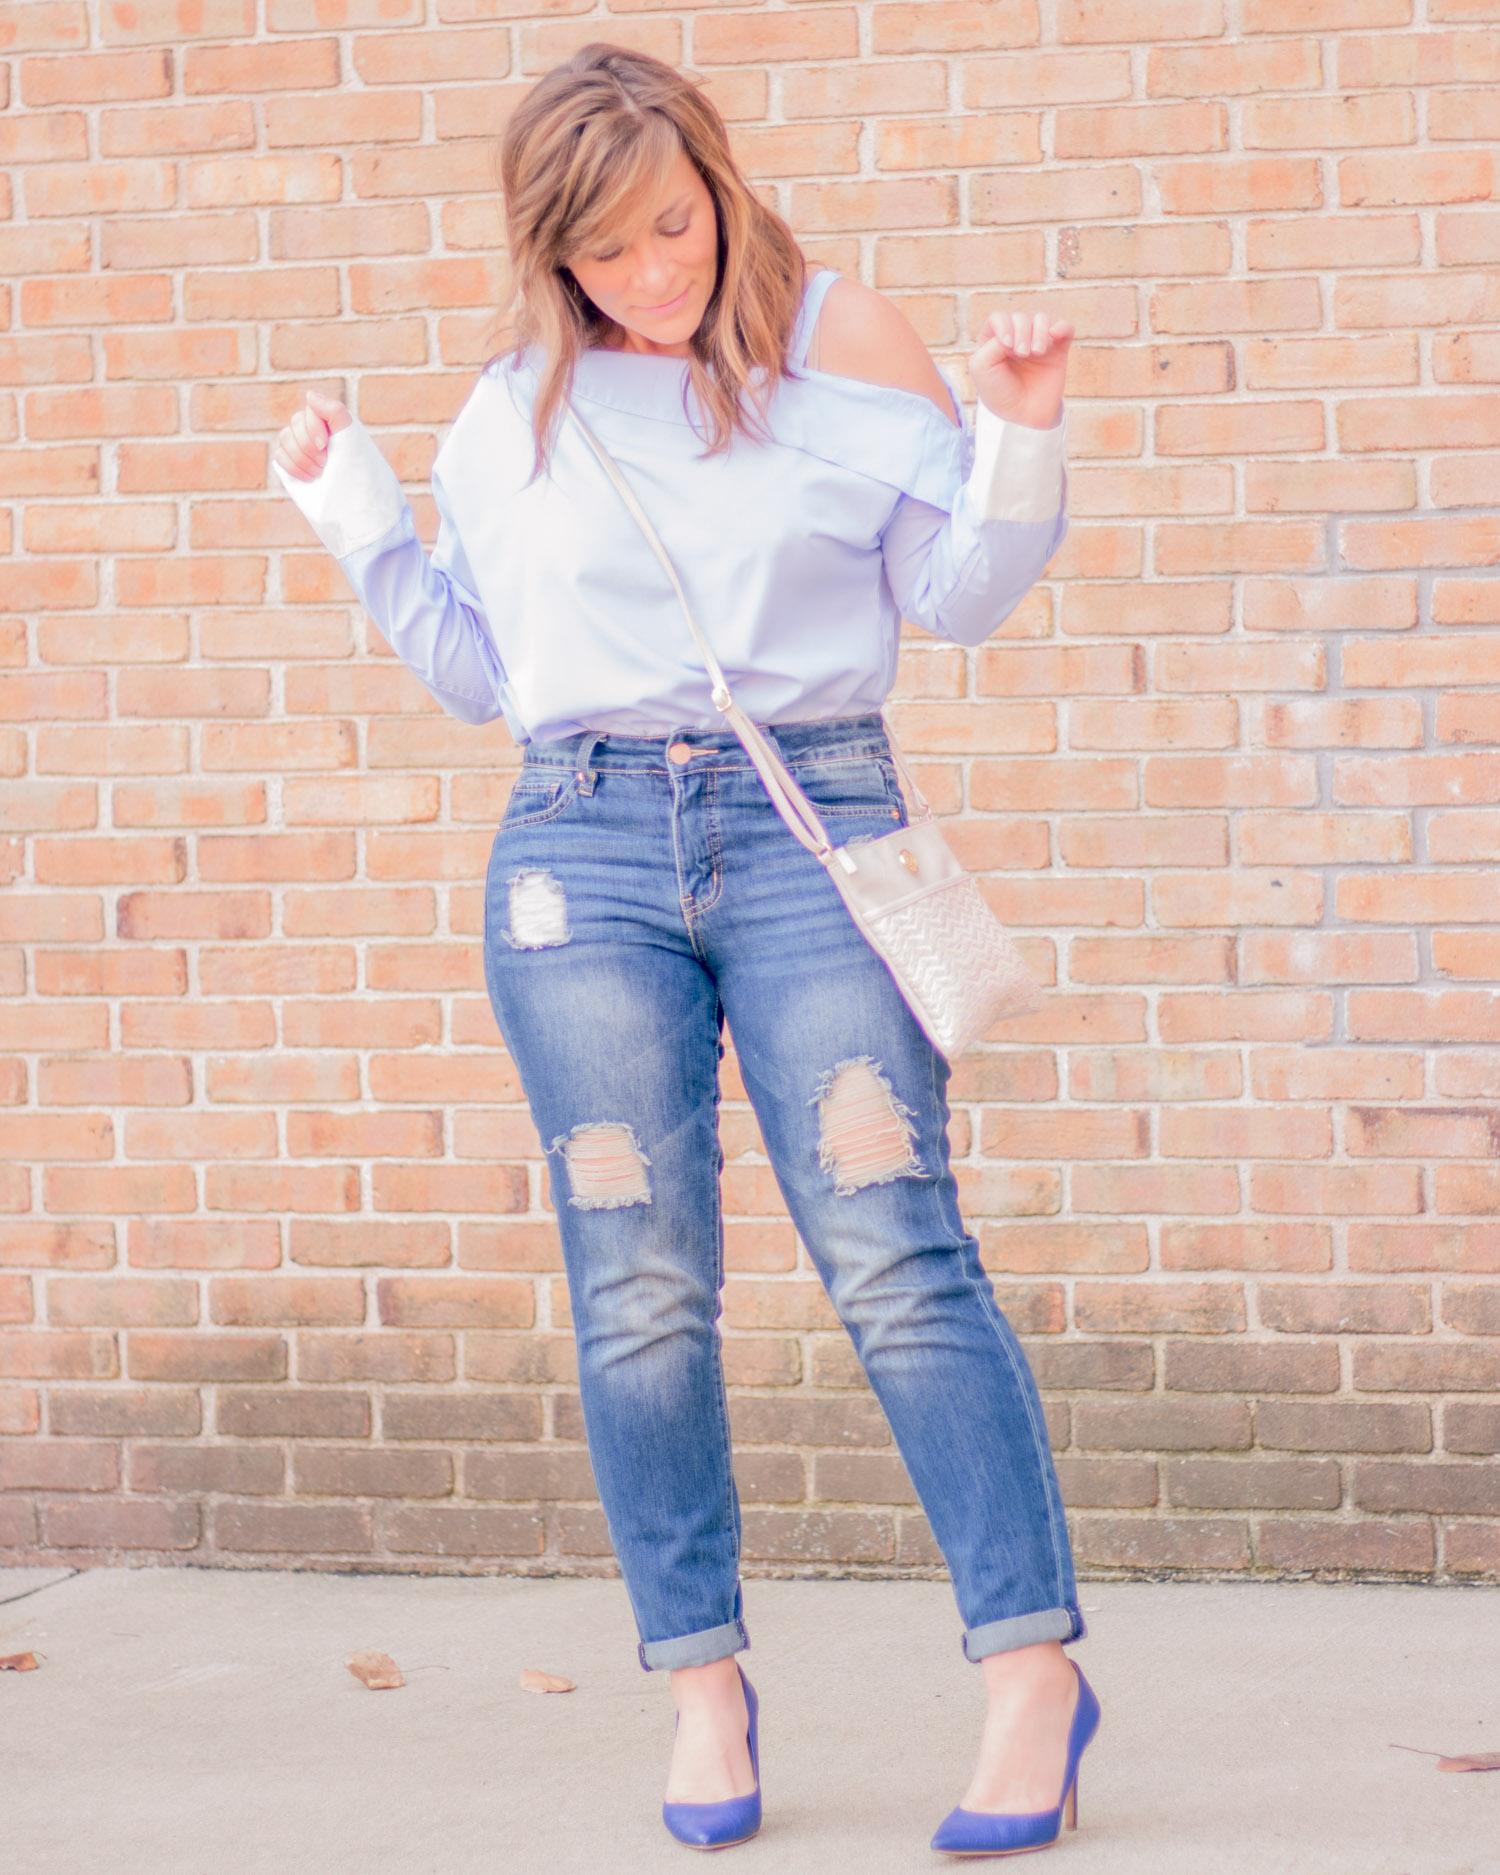 off-shoulder-top-and-jeans.jpg